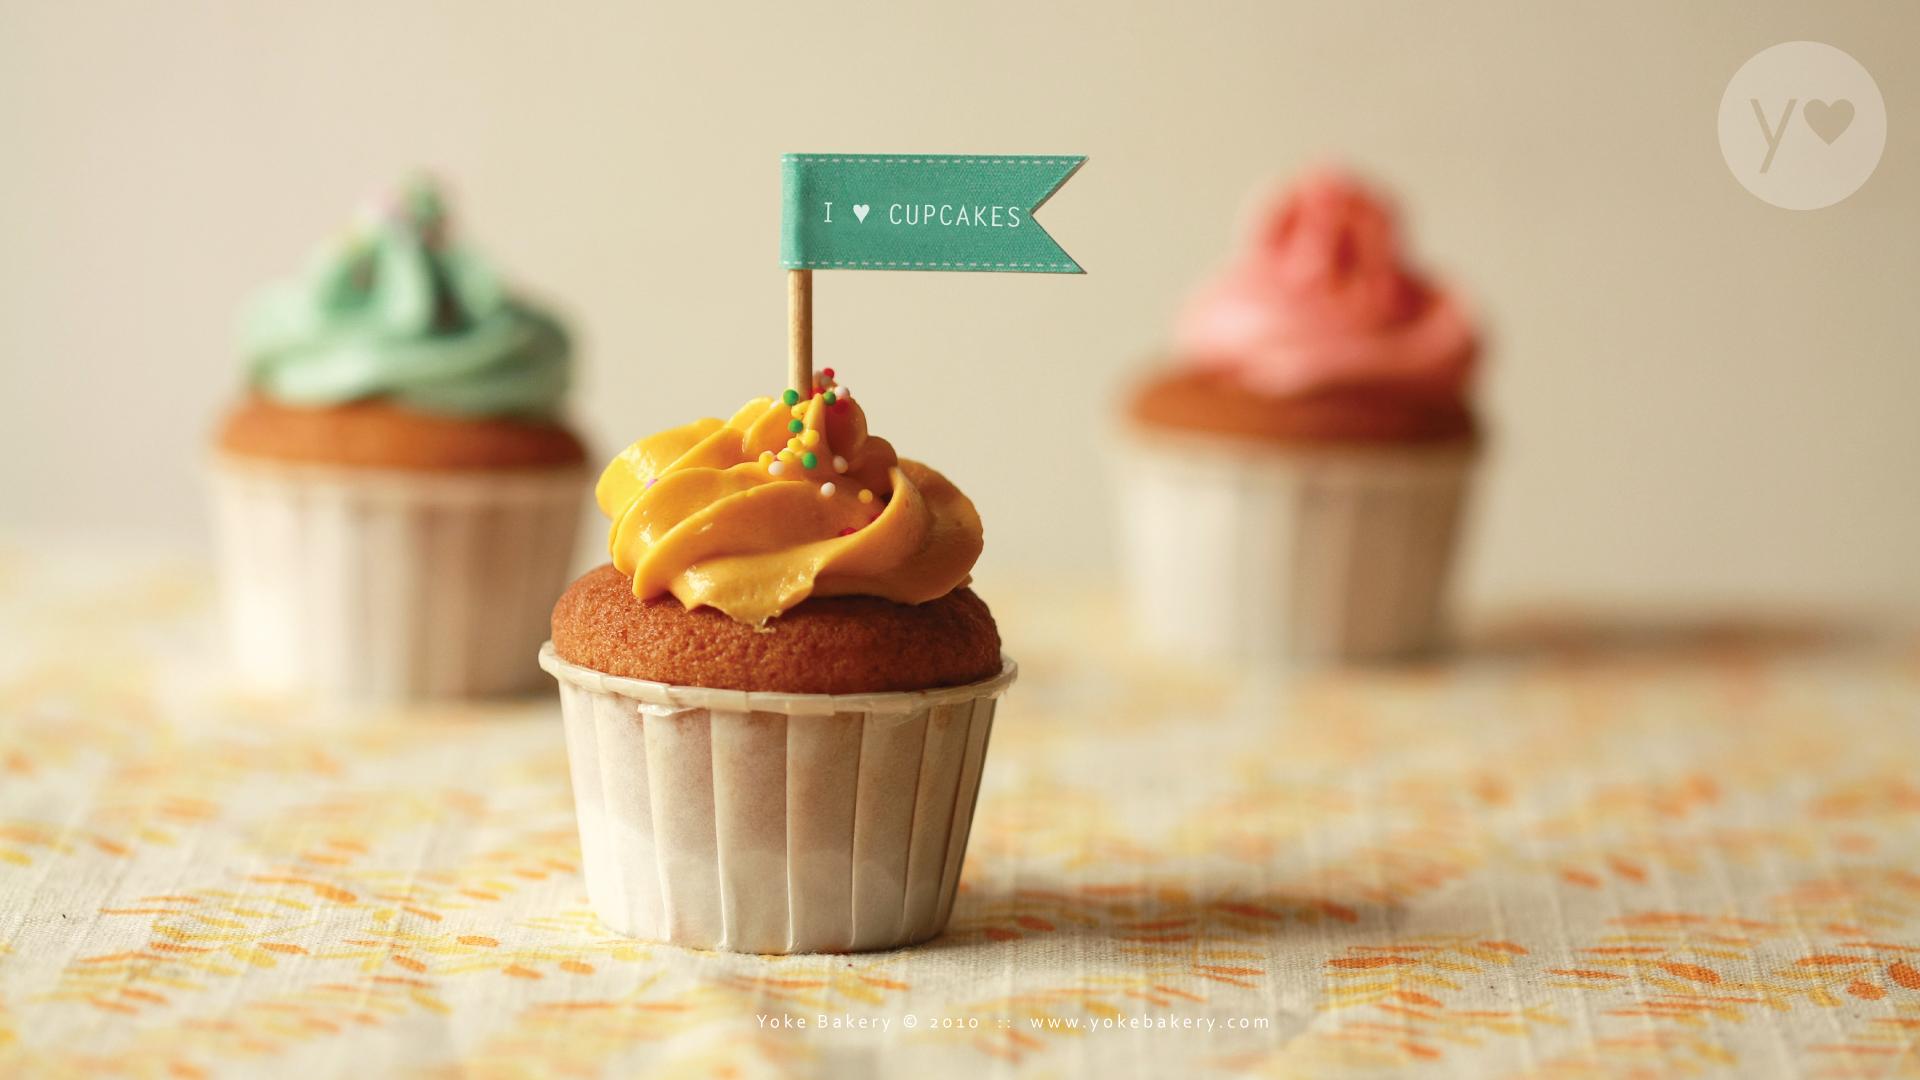 Cool Cupcakes Recipes Wallpaper Cupcake Wallpapers Hd Pixelstalk Mobile Phone Cupcakes Wallpapers Hd Desktop Backgrounds 1920x1080